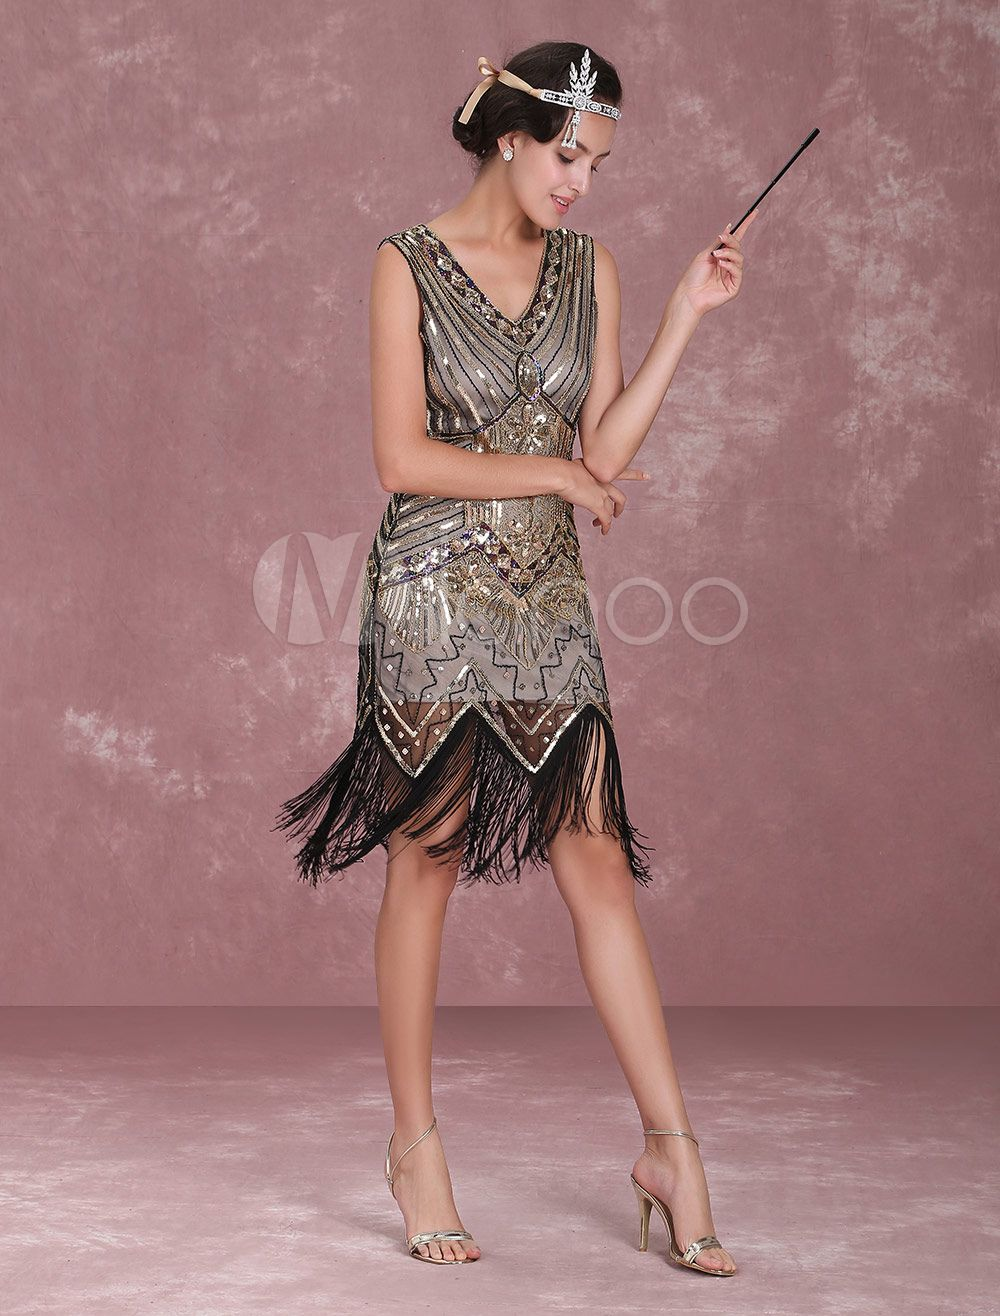 1cd5c75f2a0aac Great Gatsby Flapper Dress 1920s Vintage Costume Women's Apricot Sequined  Tassels Dress Halloween